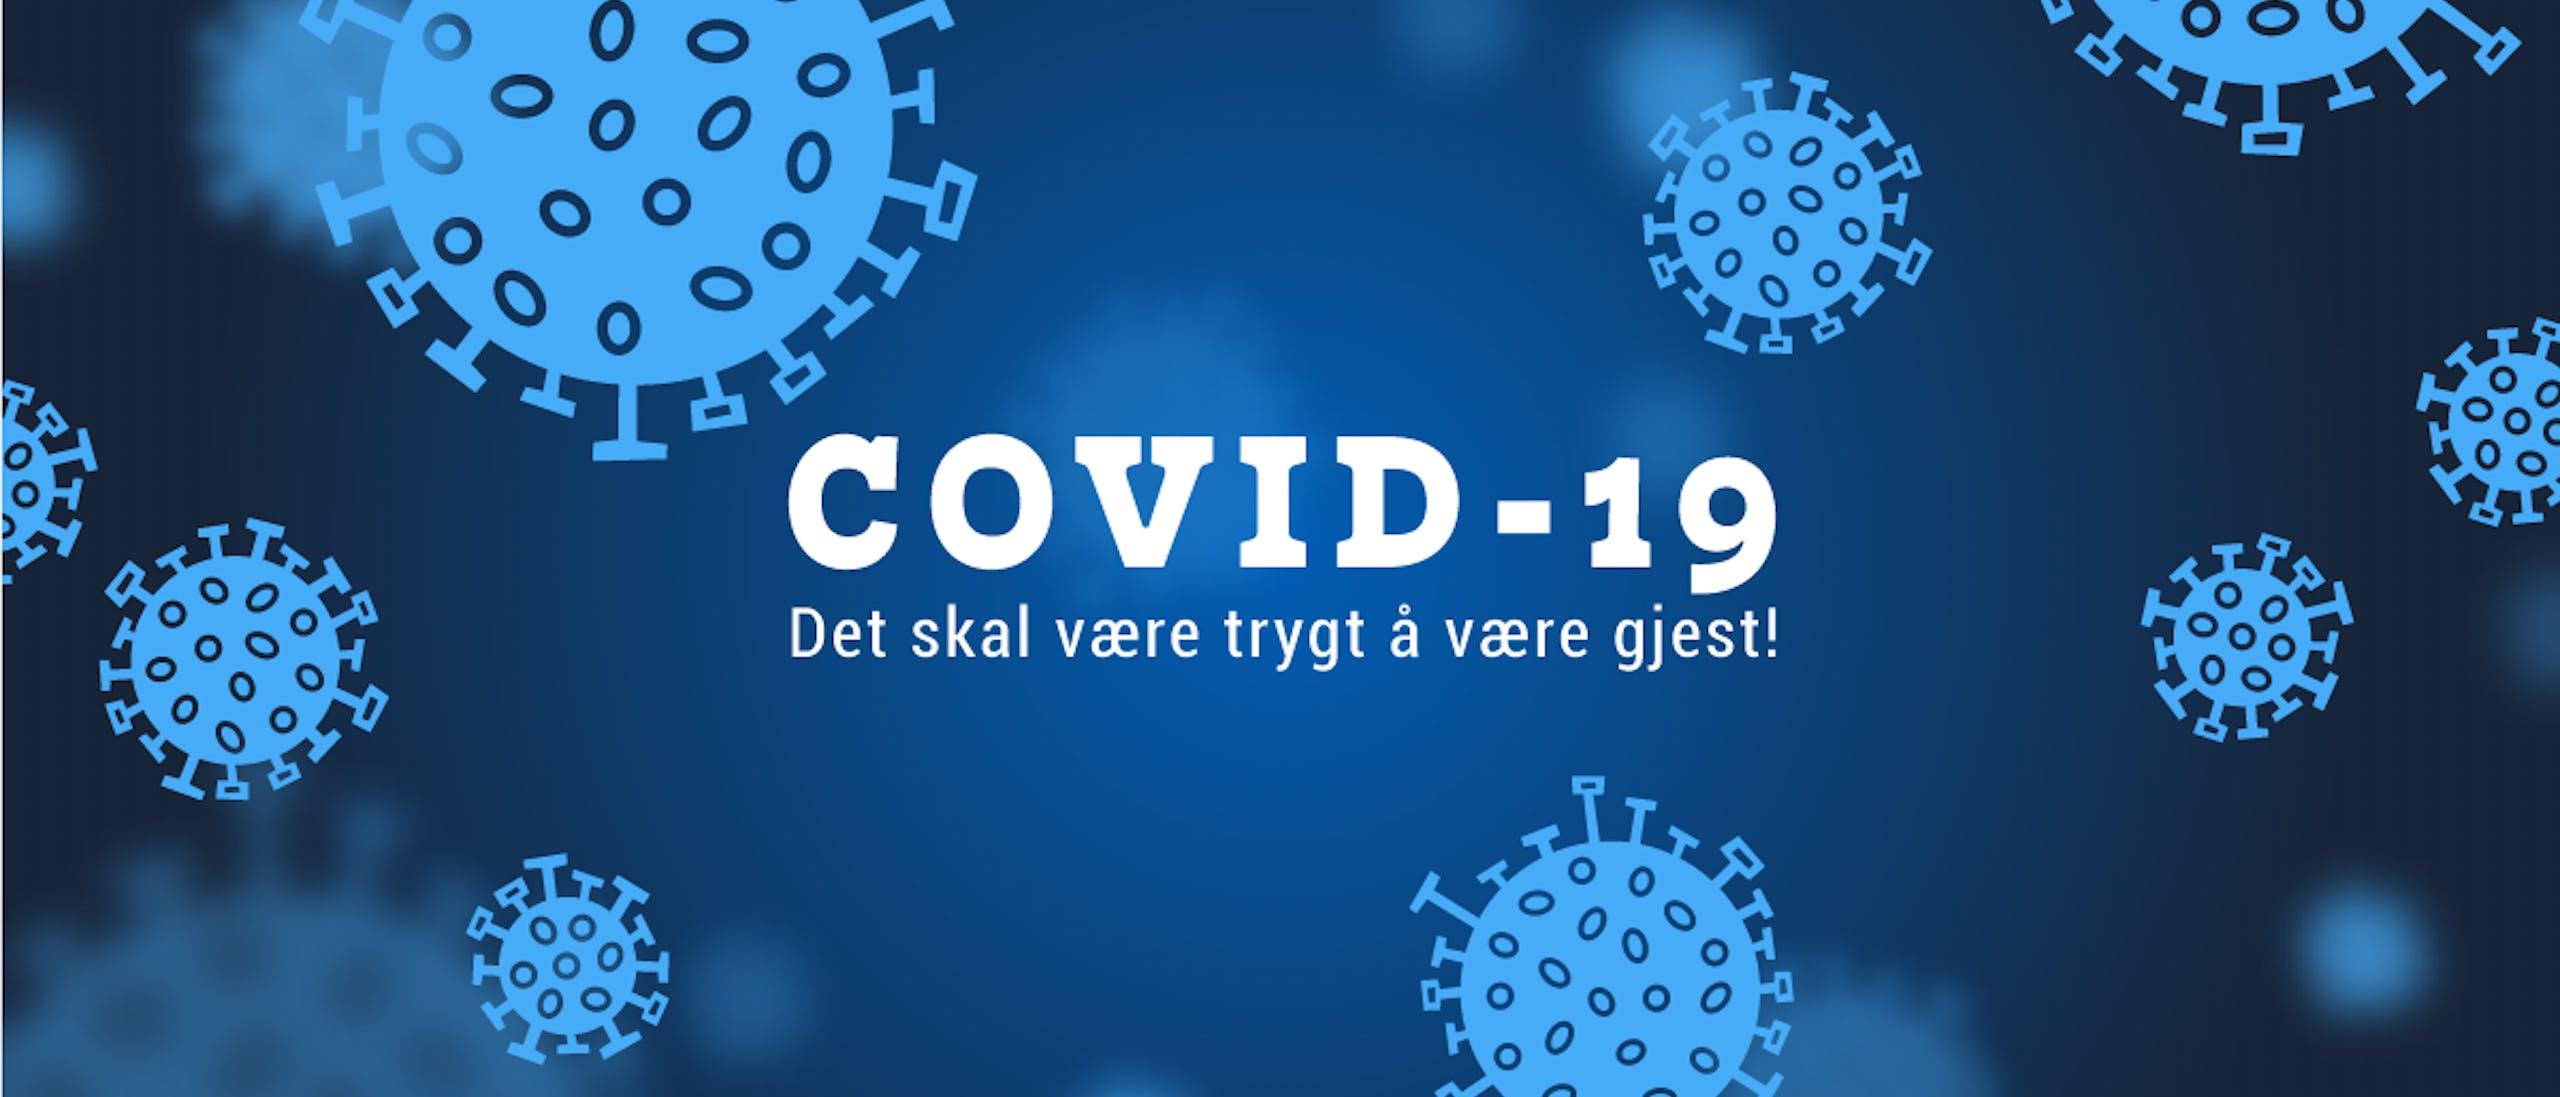 Corvid19 Nettplakat